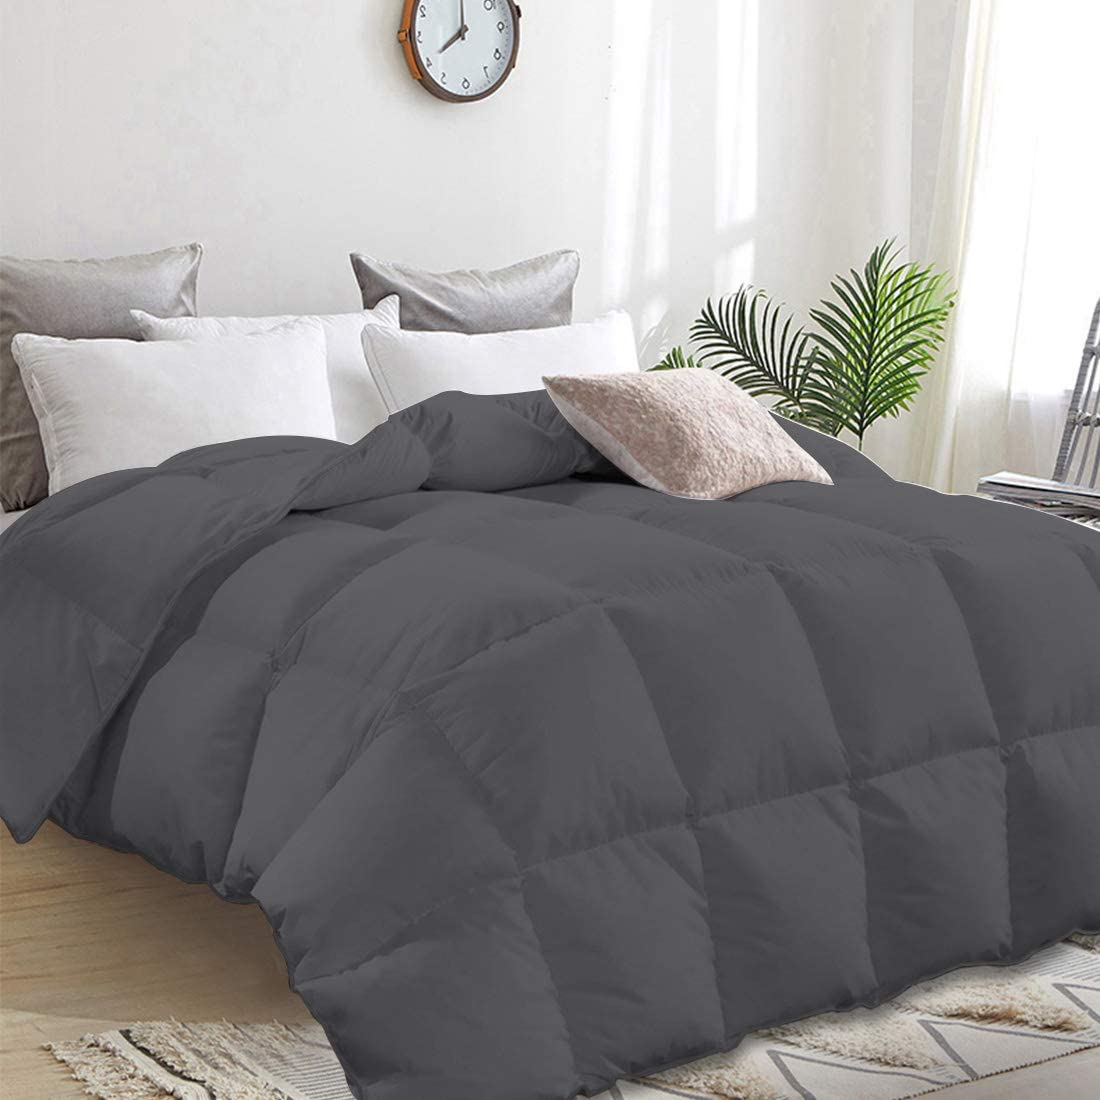 Down Comforter Queen Duvet Insert Down Alternative Quilted Comforter All Season,Plush Microfiber Fill,Machine Washable,Warm Comforter,Dark Grey